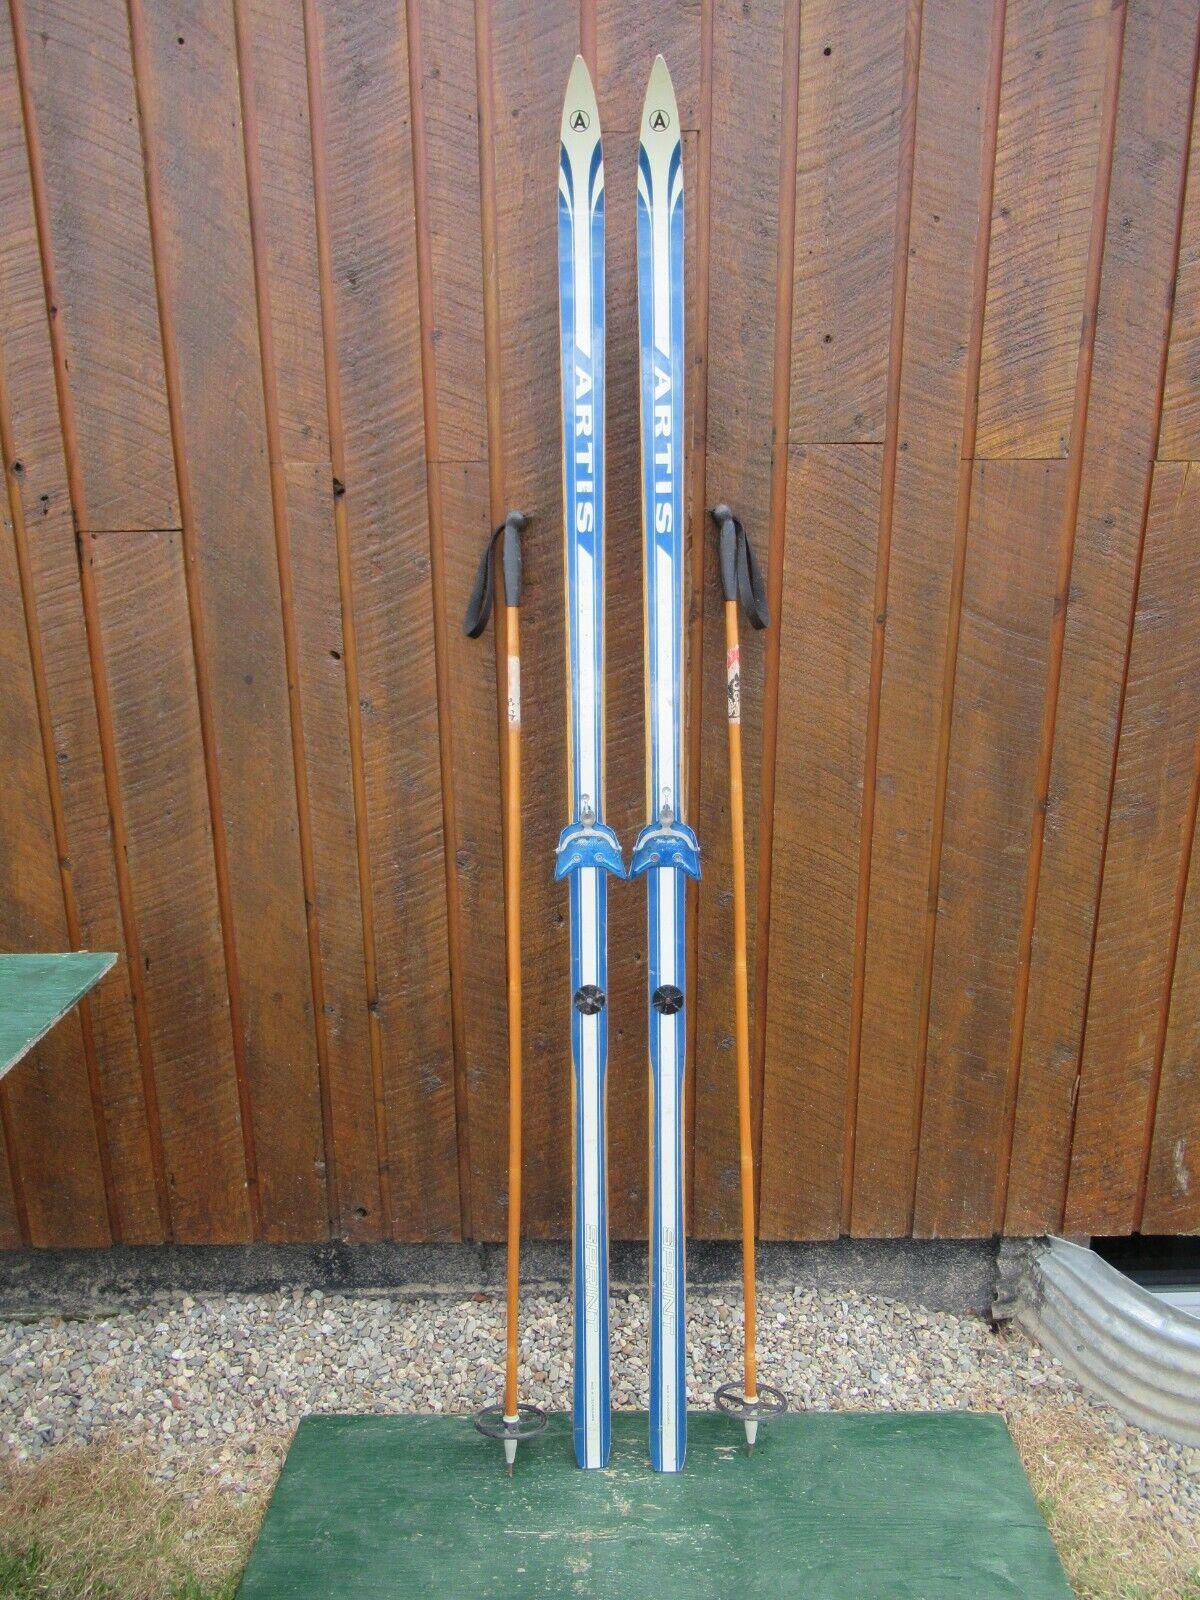 VINTAGE Wooden 79  Skis Has Metal Bindings + Beautiful Blau Finish + Bamboo Pole